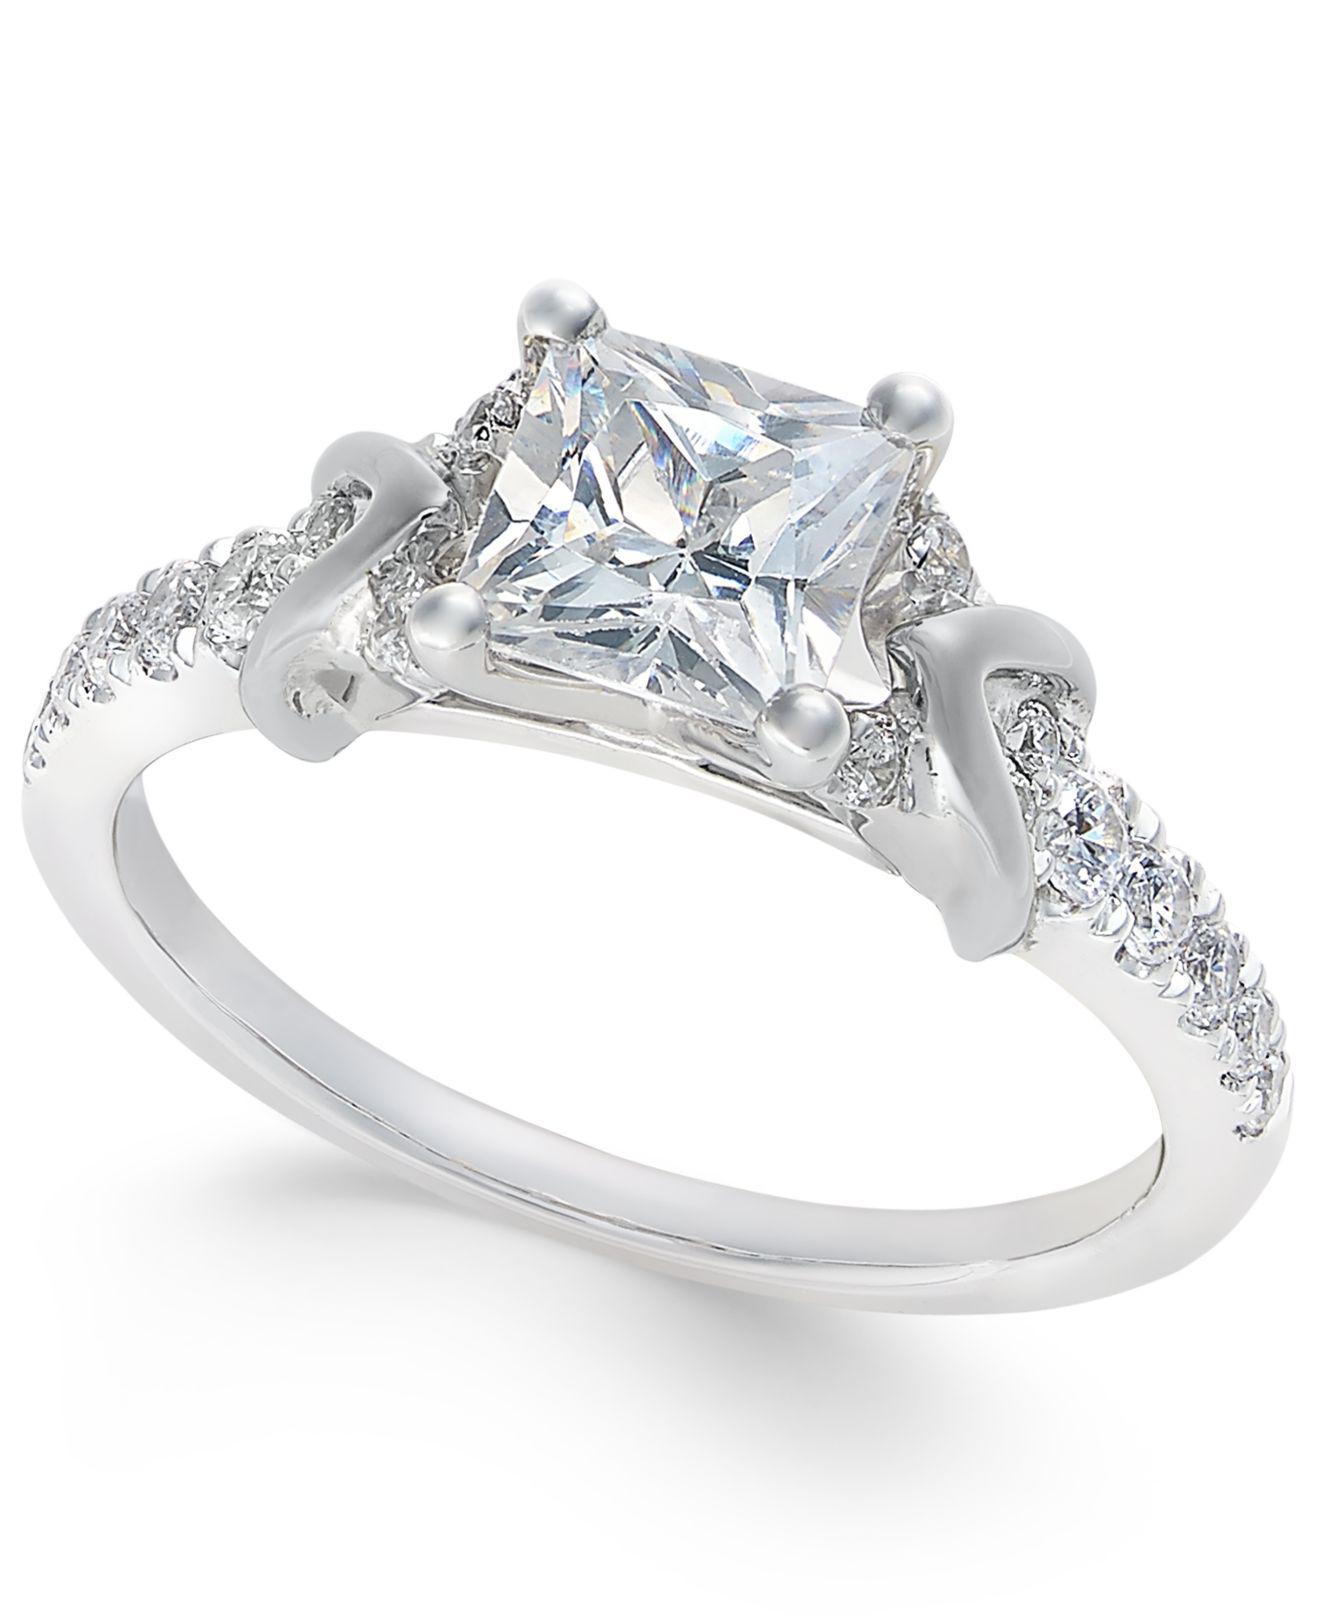 Engagement Rings On Sale Macys